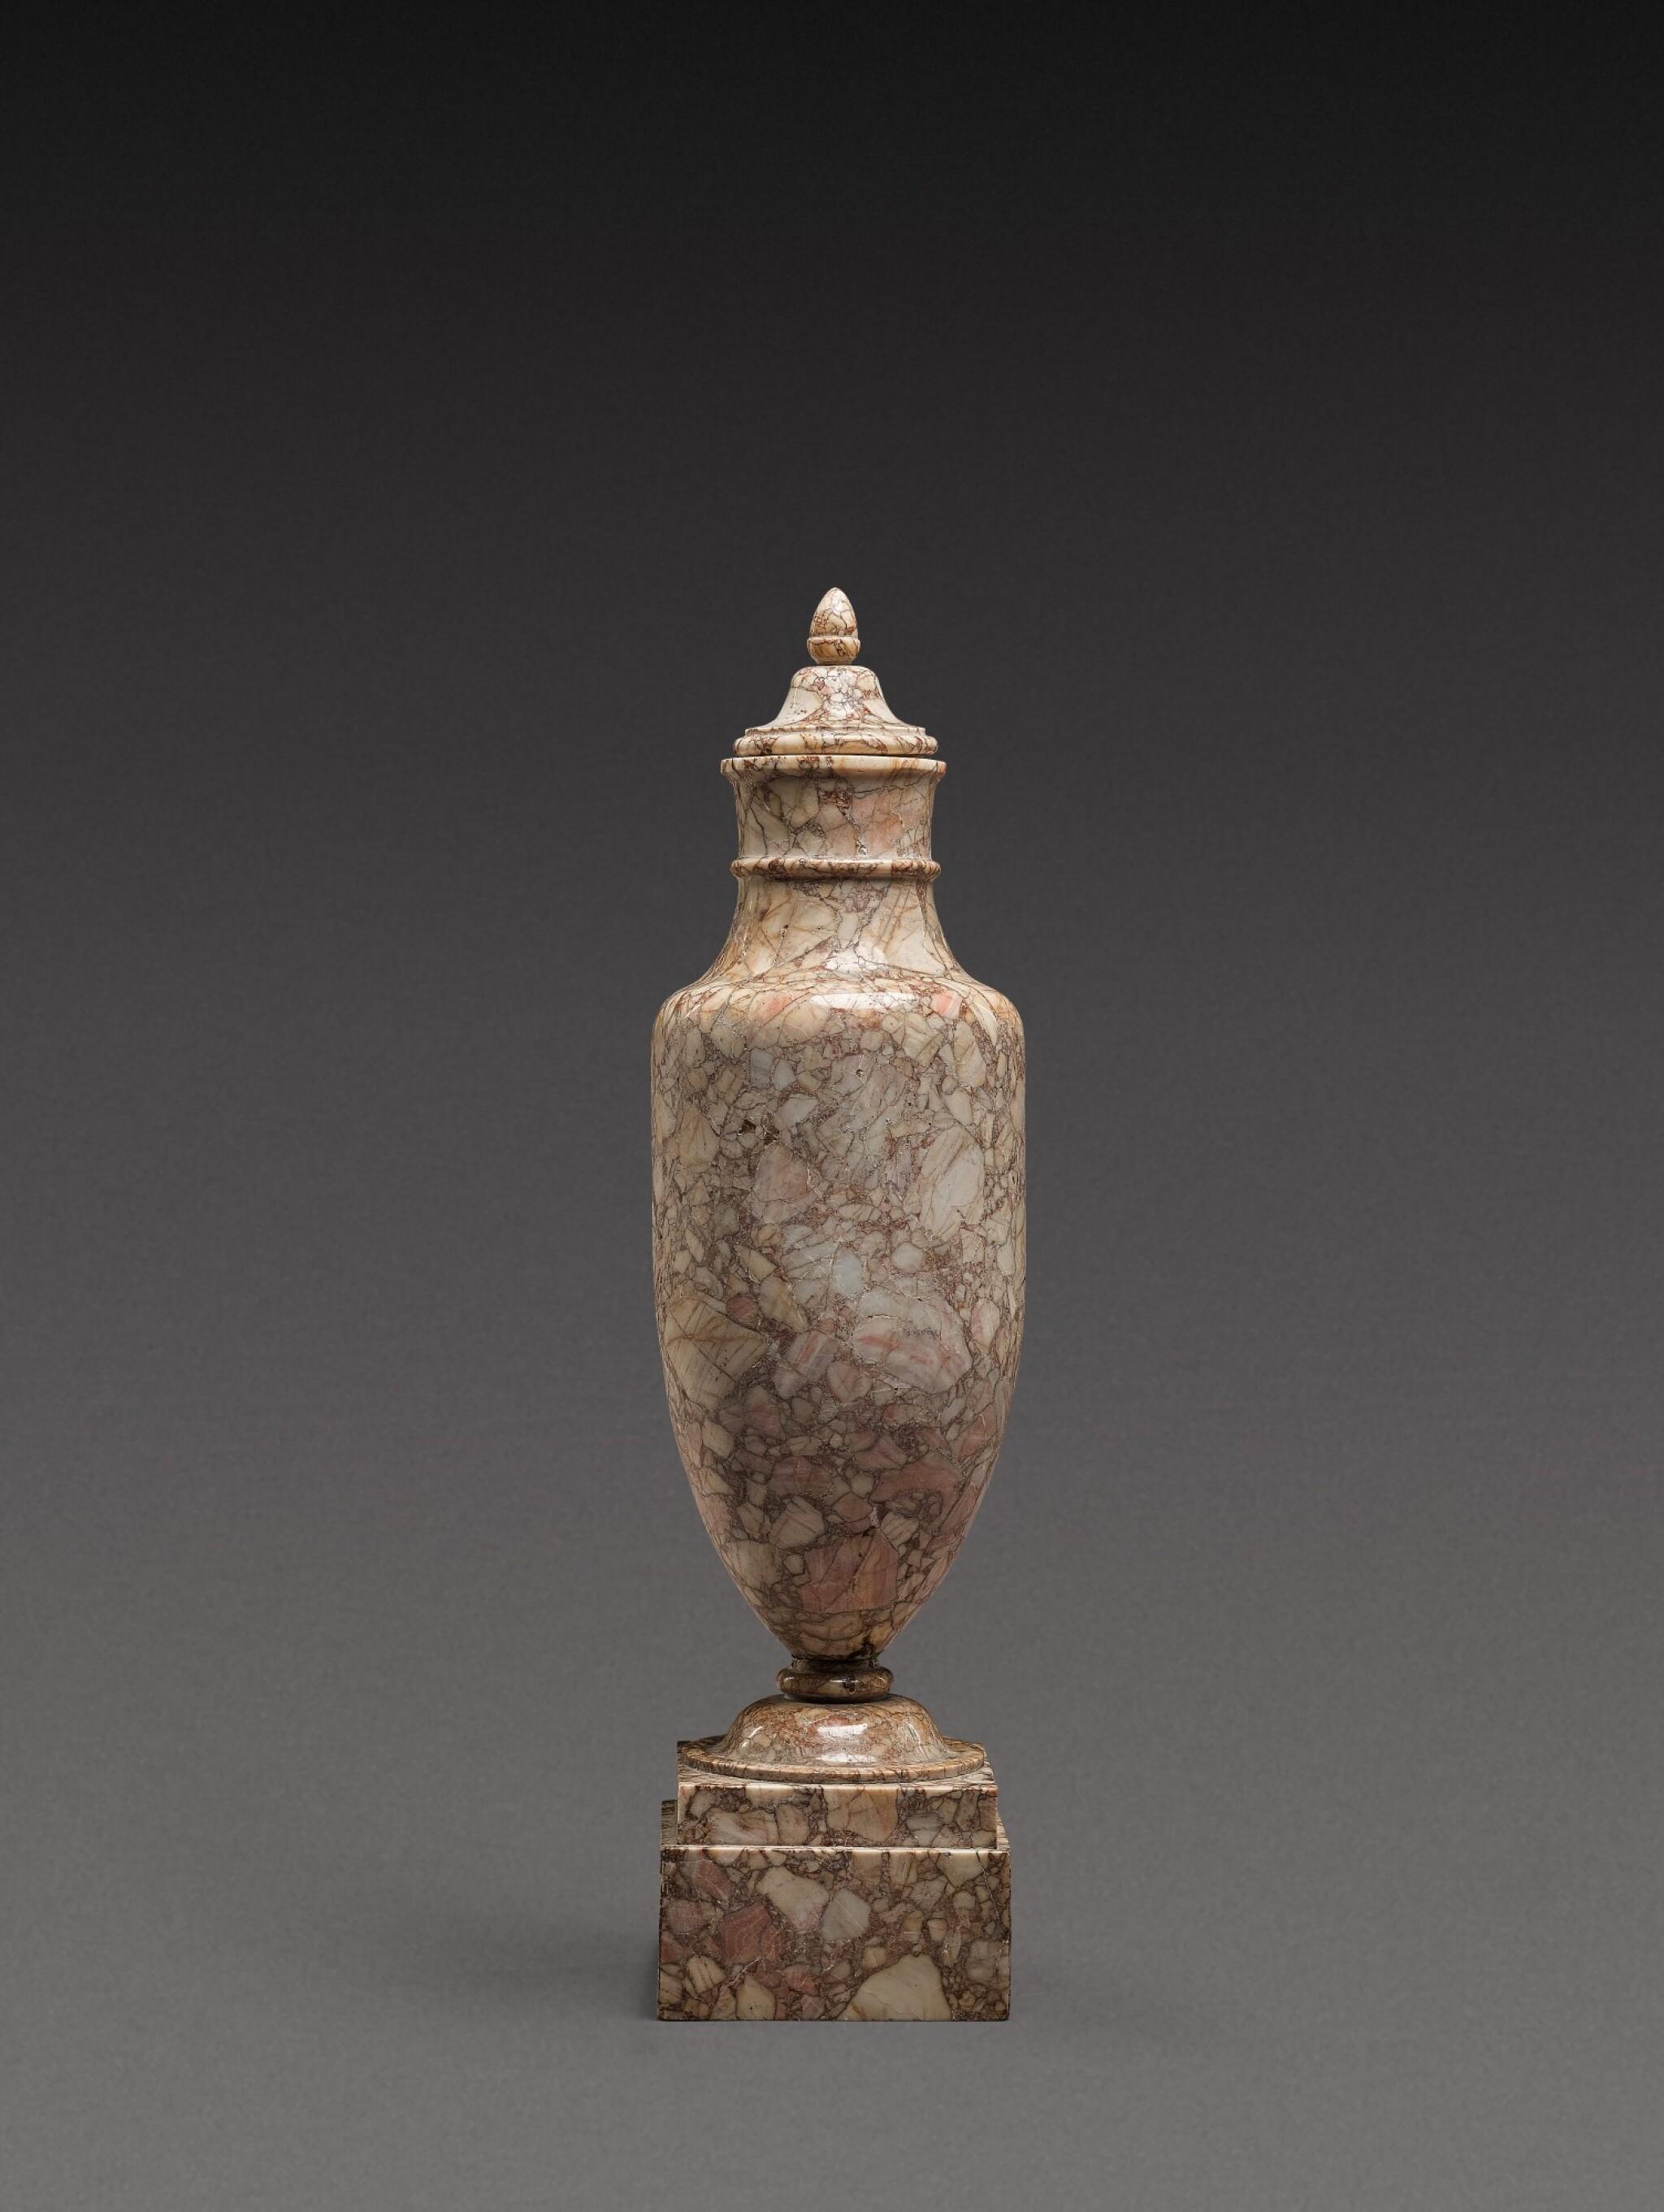 View 1 of Lot 167. An Italian breccia dorata marble vase, circa 1800.